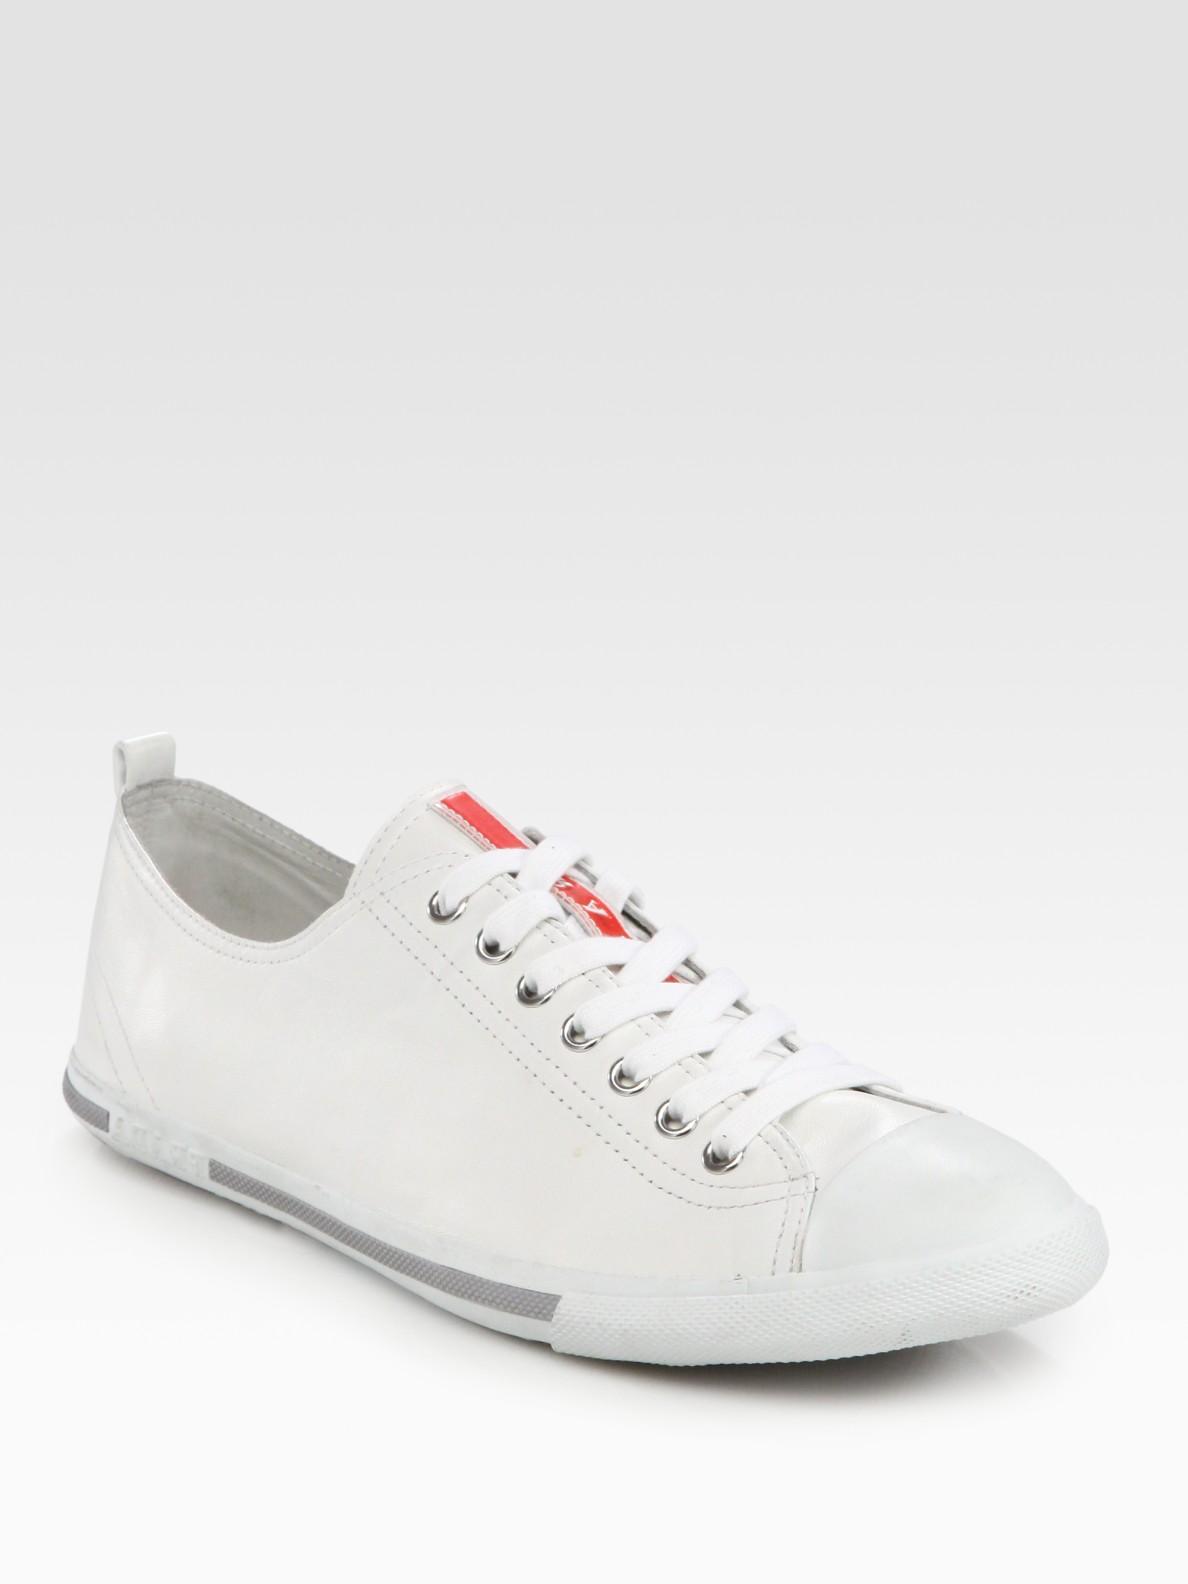 Prada White Cap Toe Platform Slip-On Sneakers lm9cpVV